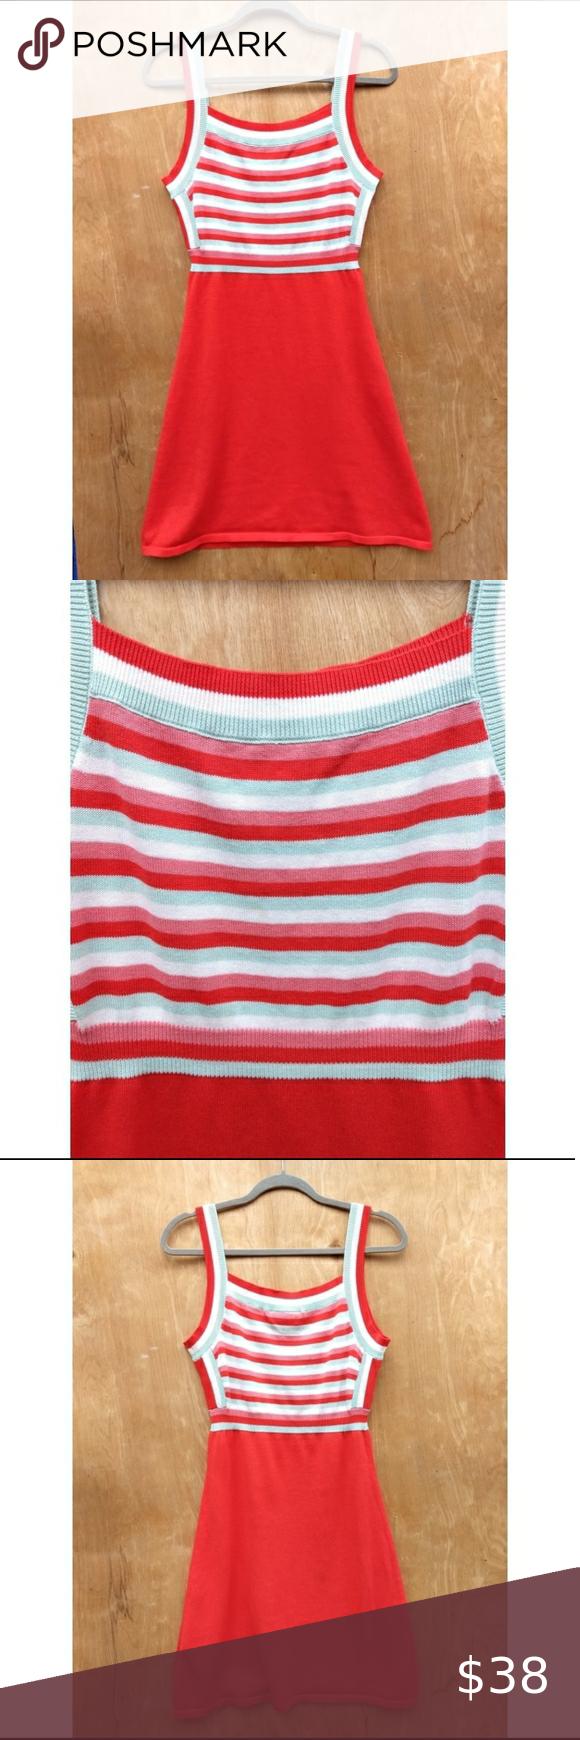 Modcloth Red Stripe Sleeveless Sweater Mini Dress Mini Sweater Dress Mod Cloth Dresses Sleeveless Sweater